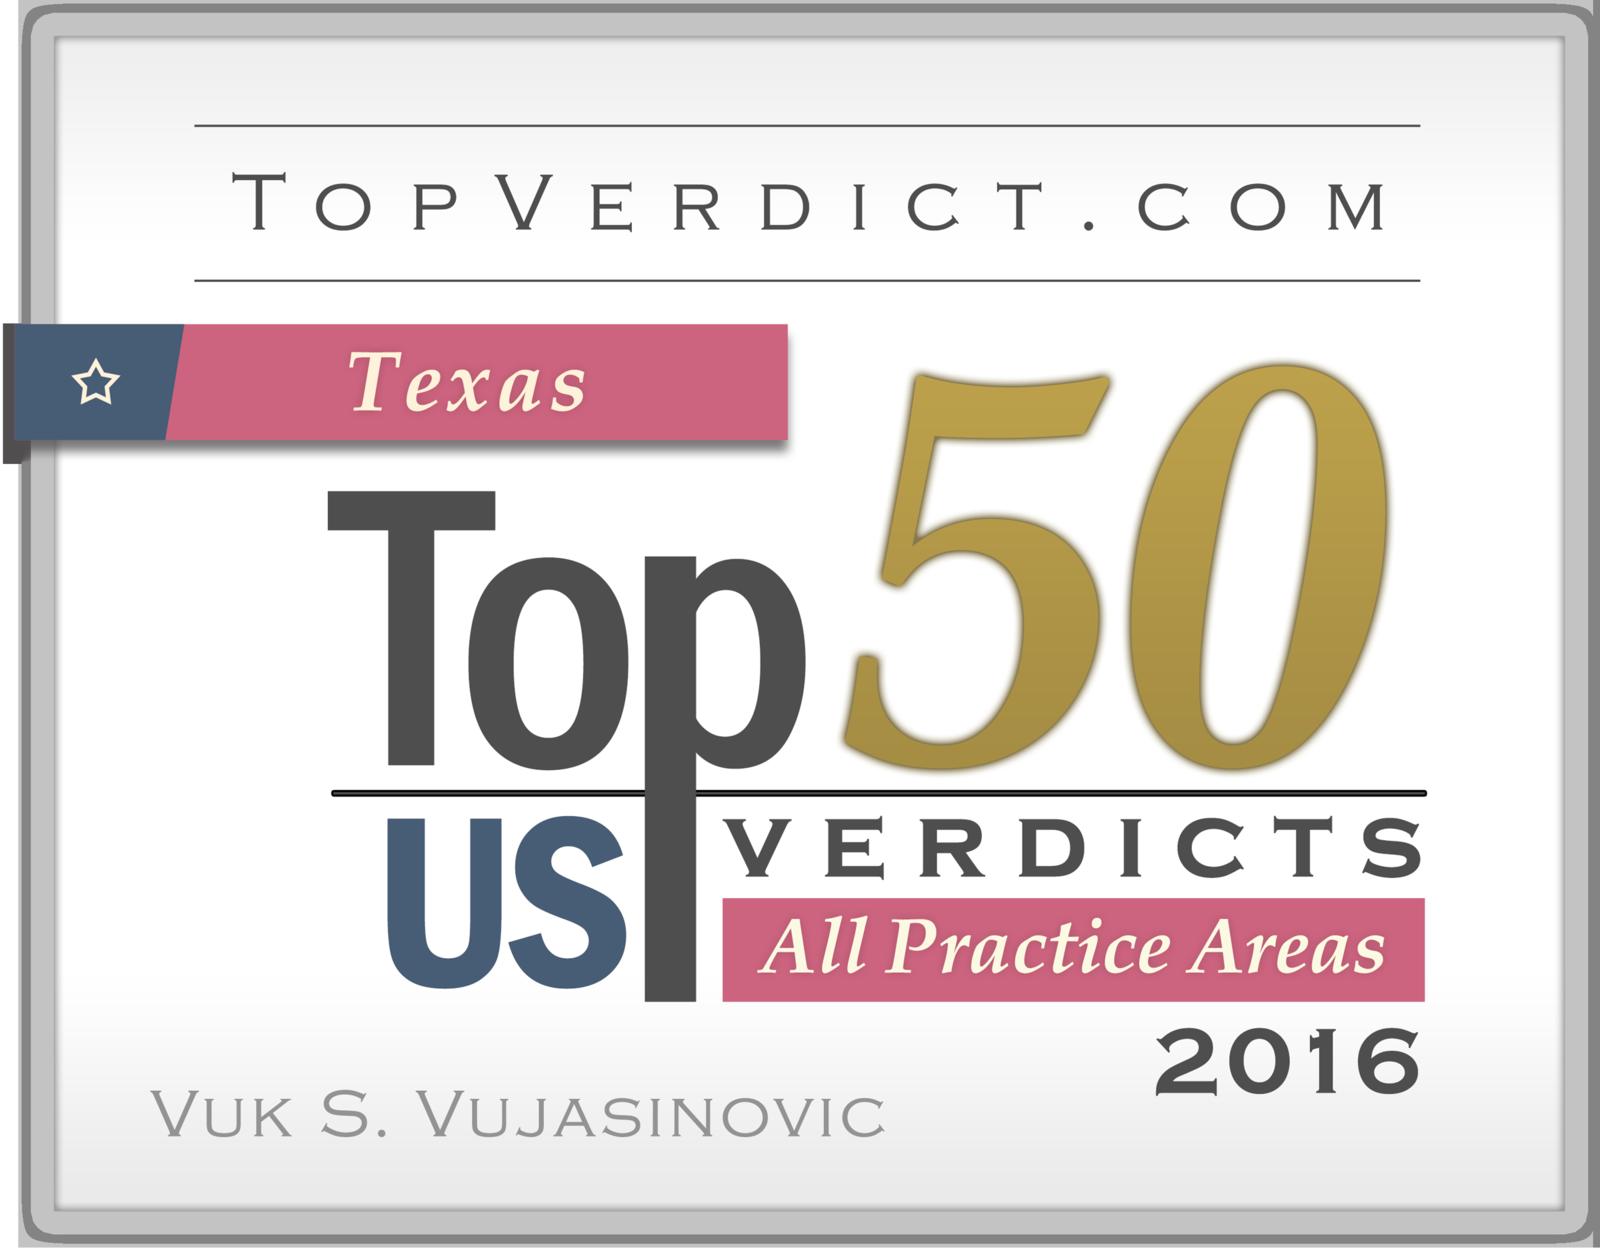 Top Verdict awards Vuk Vujasinovic for historic $17,720,000 verdict